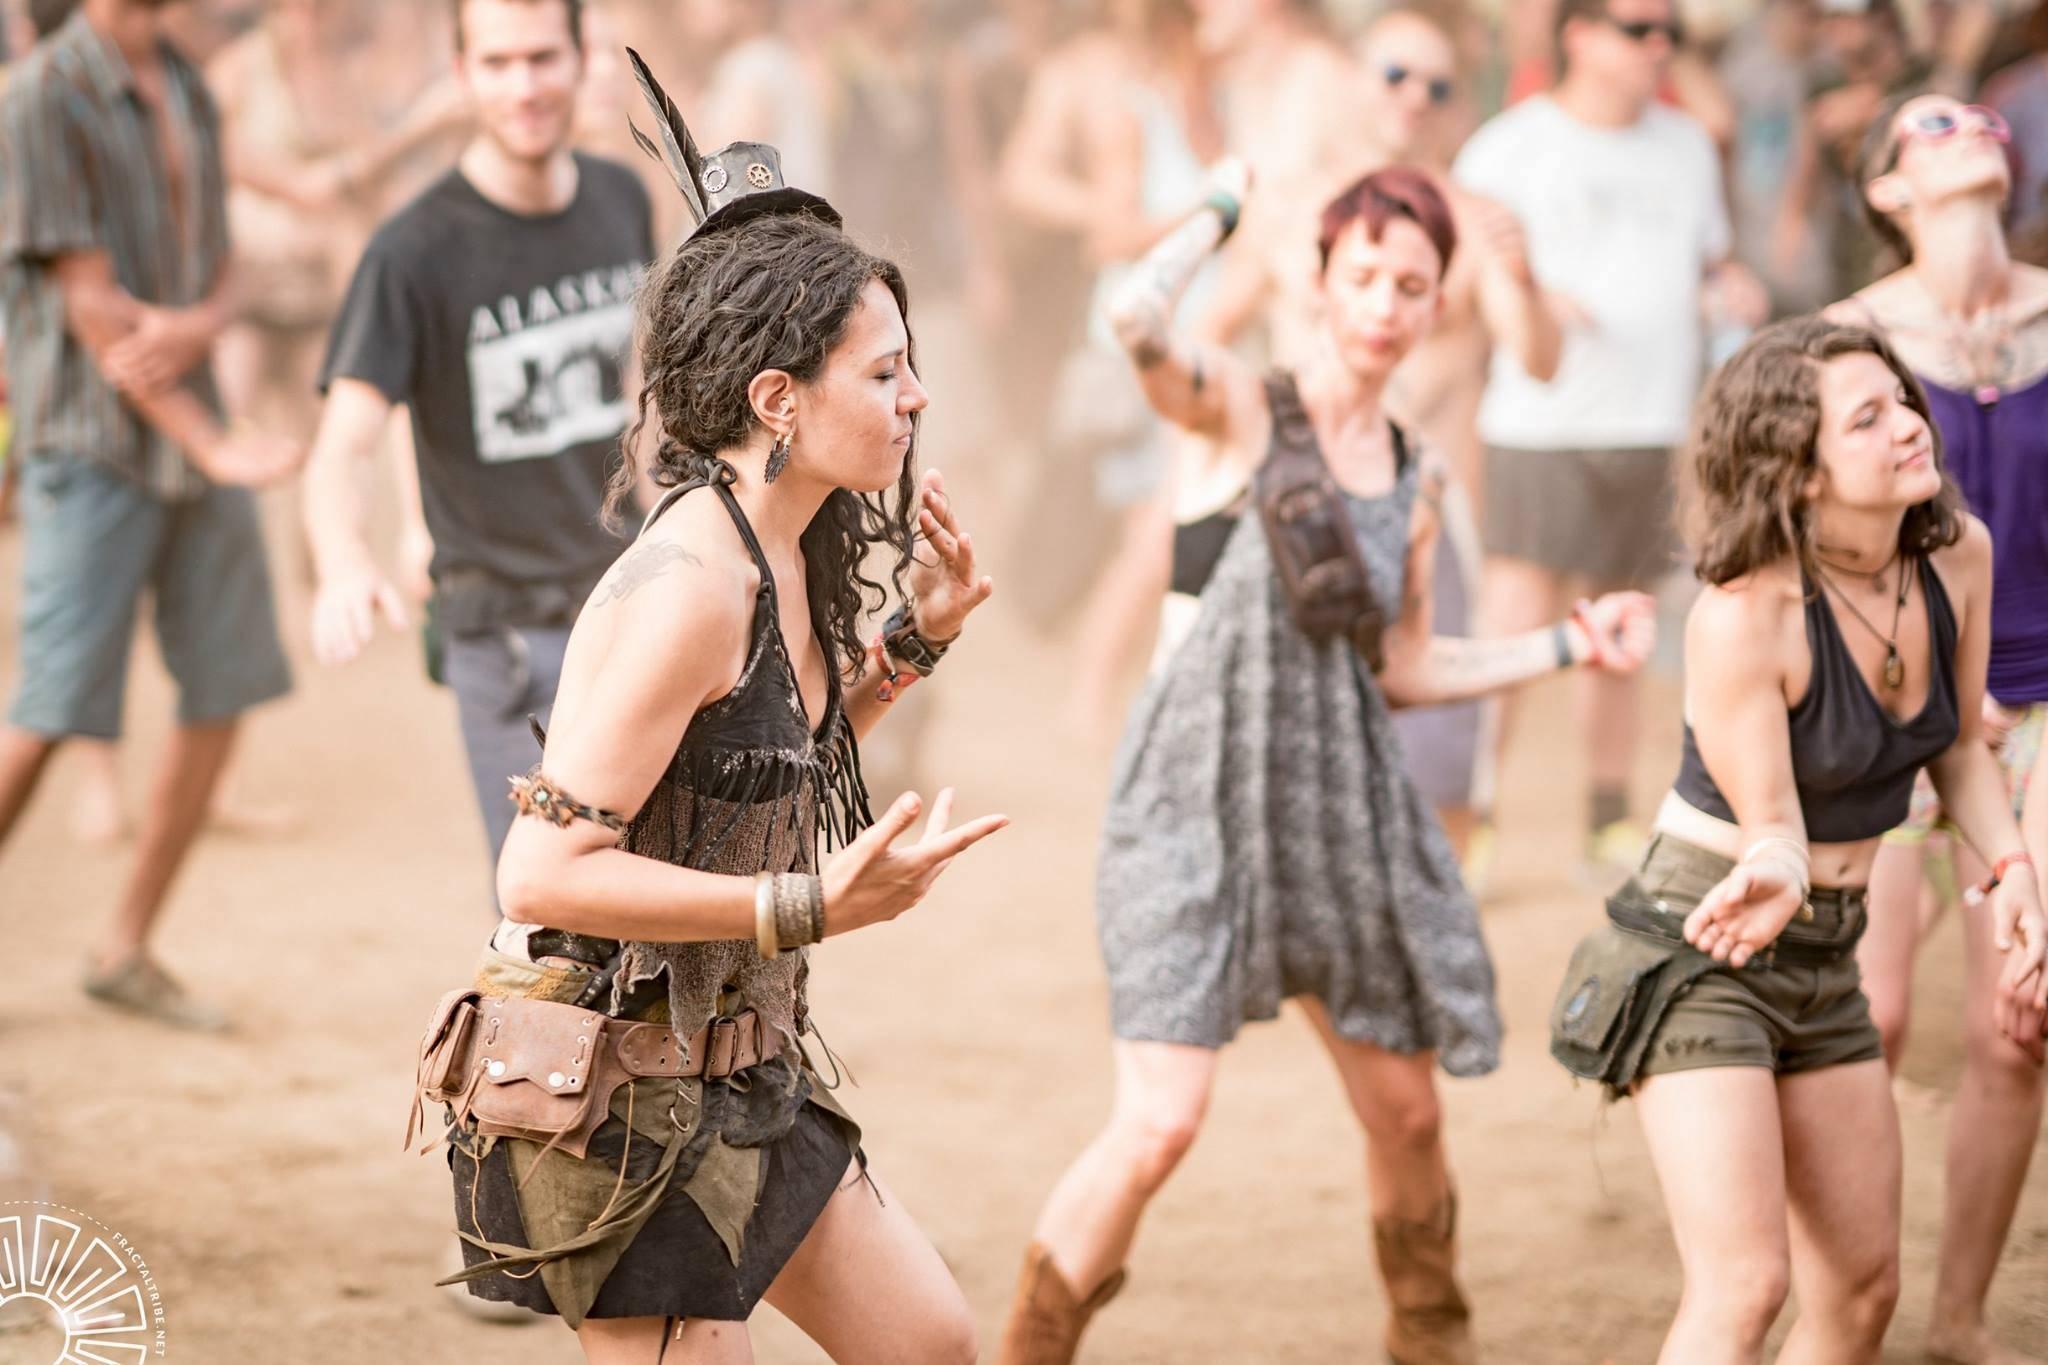 Eclipse festival 2016 dancing